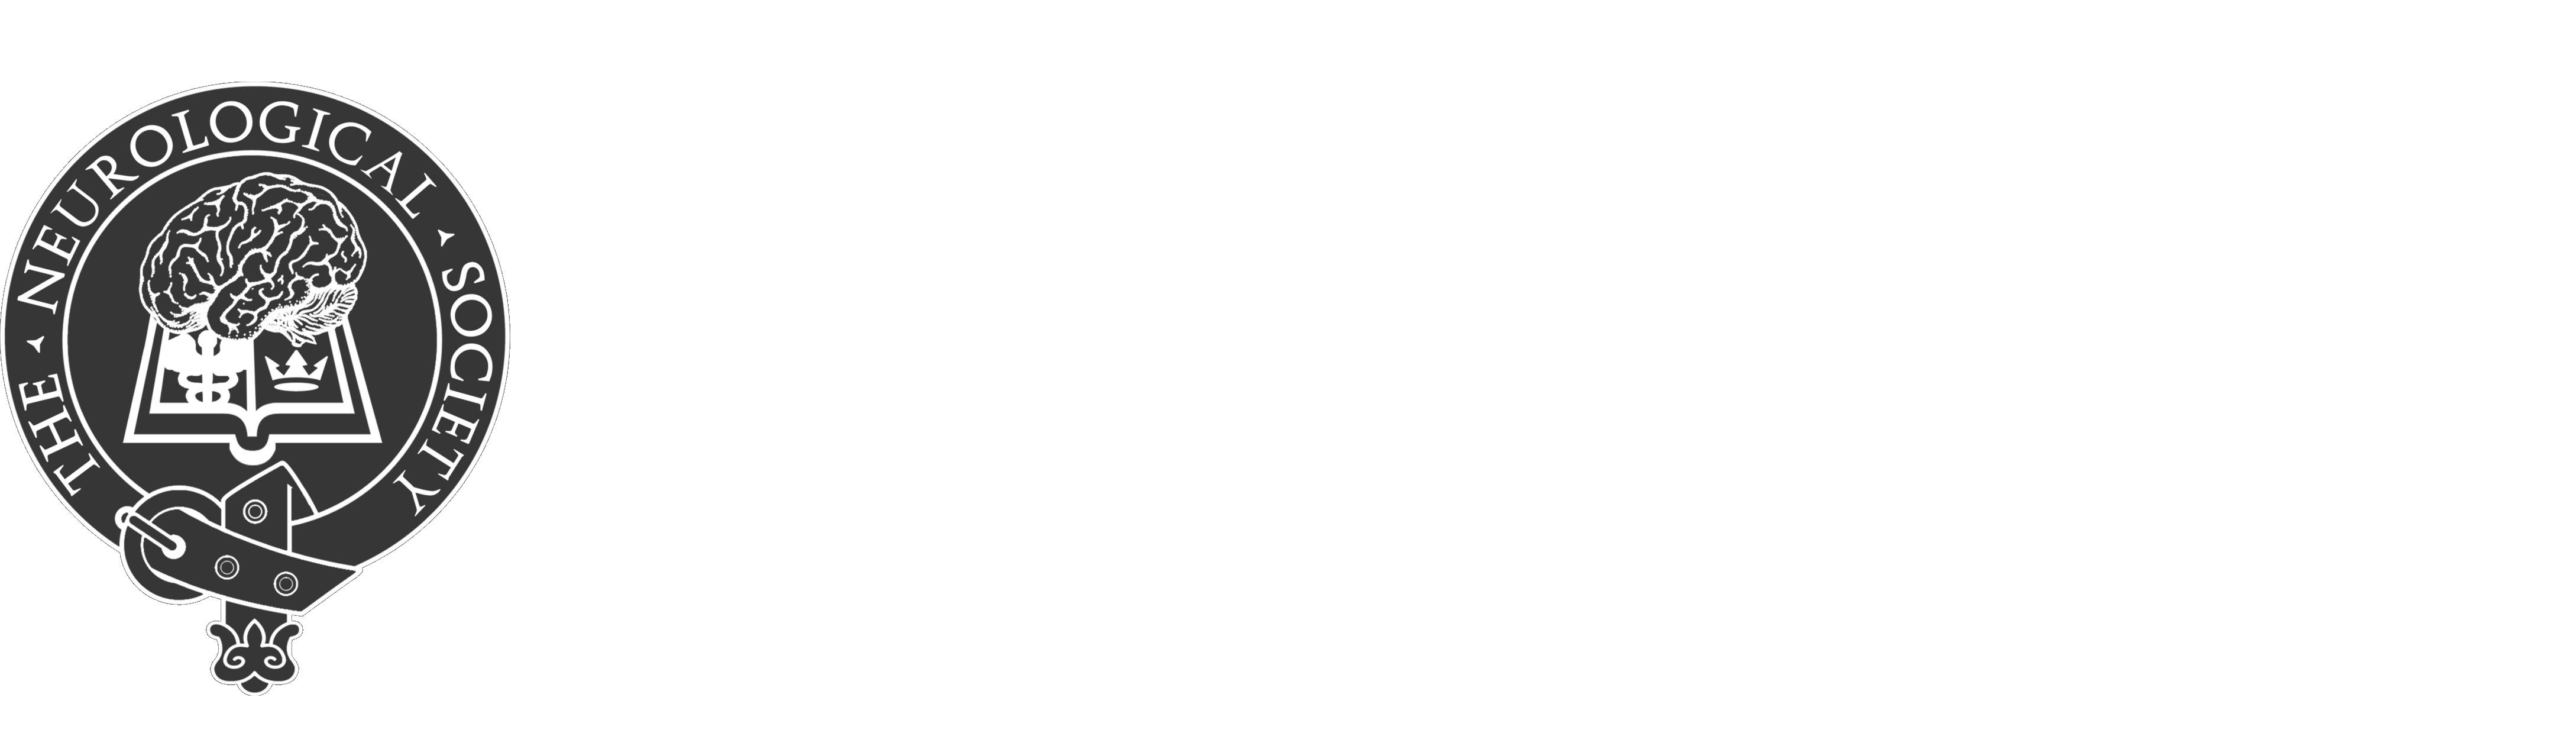 Oxford Neurological Society logo